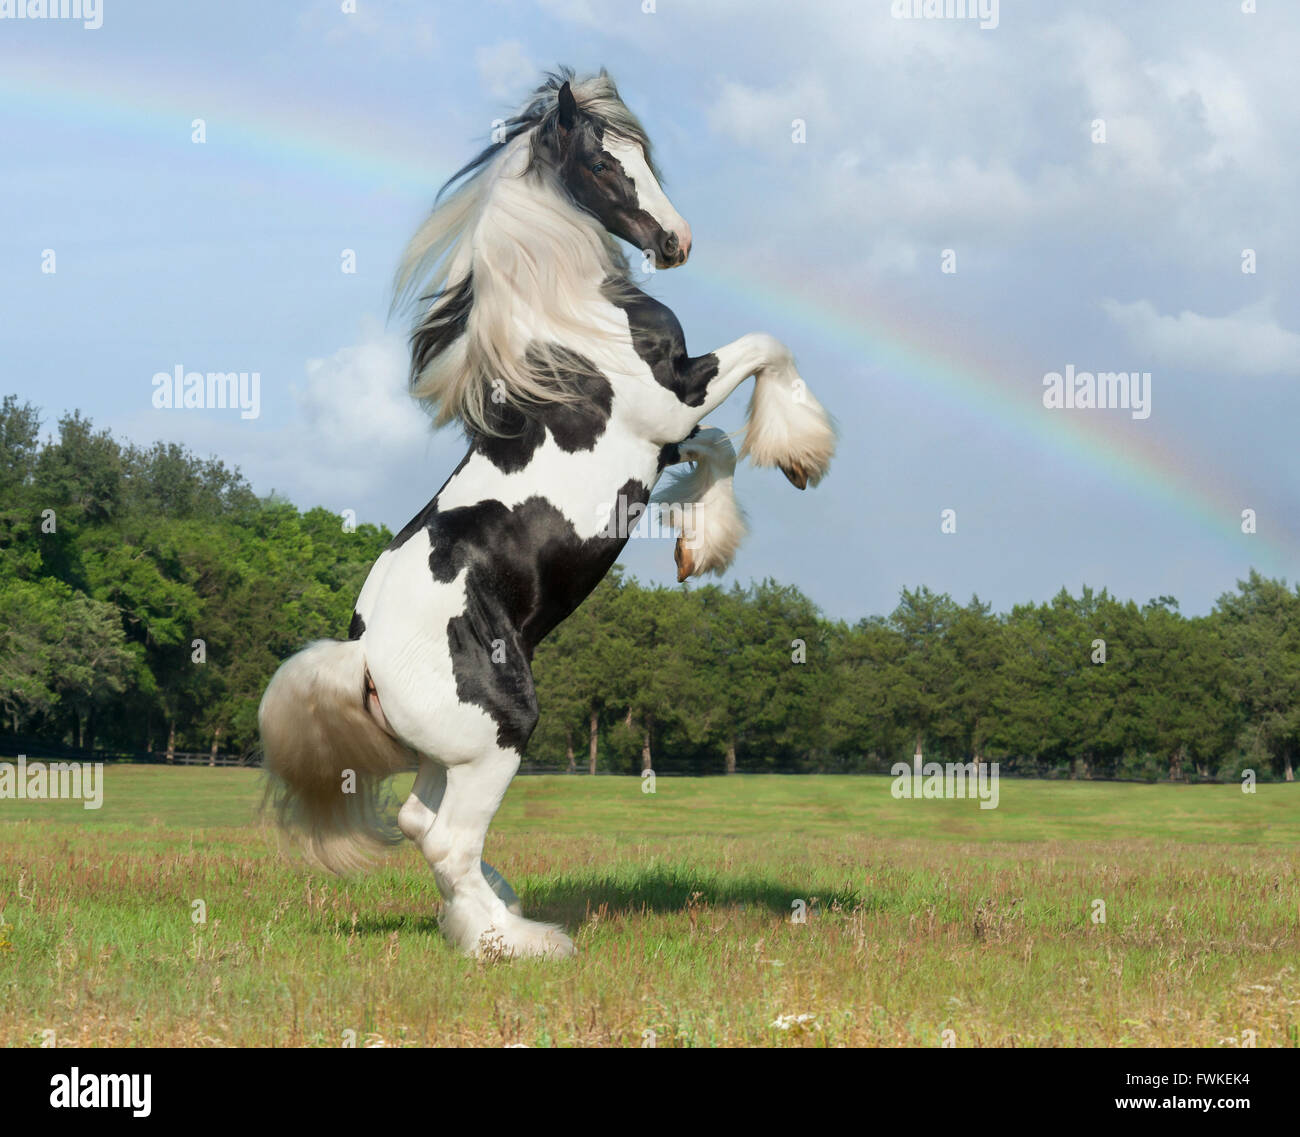 Gypsy Vanner Horse stallion - Stock Image